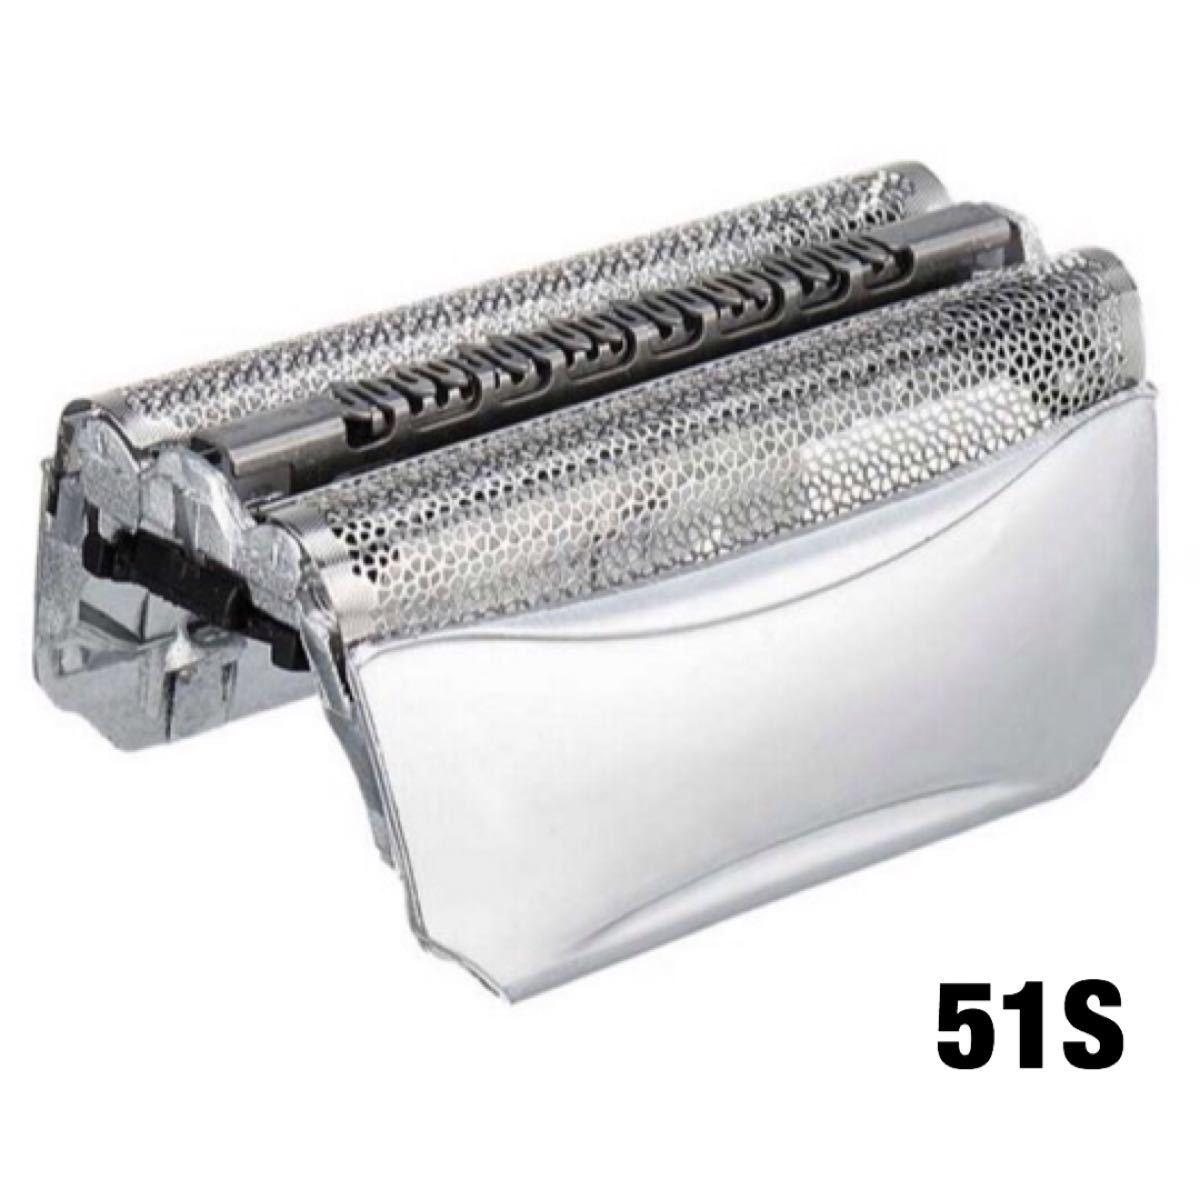 BRAUN シェーバー 替刃シリーズ5 51S(F/C51S-4) 網刃 互換品